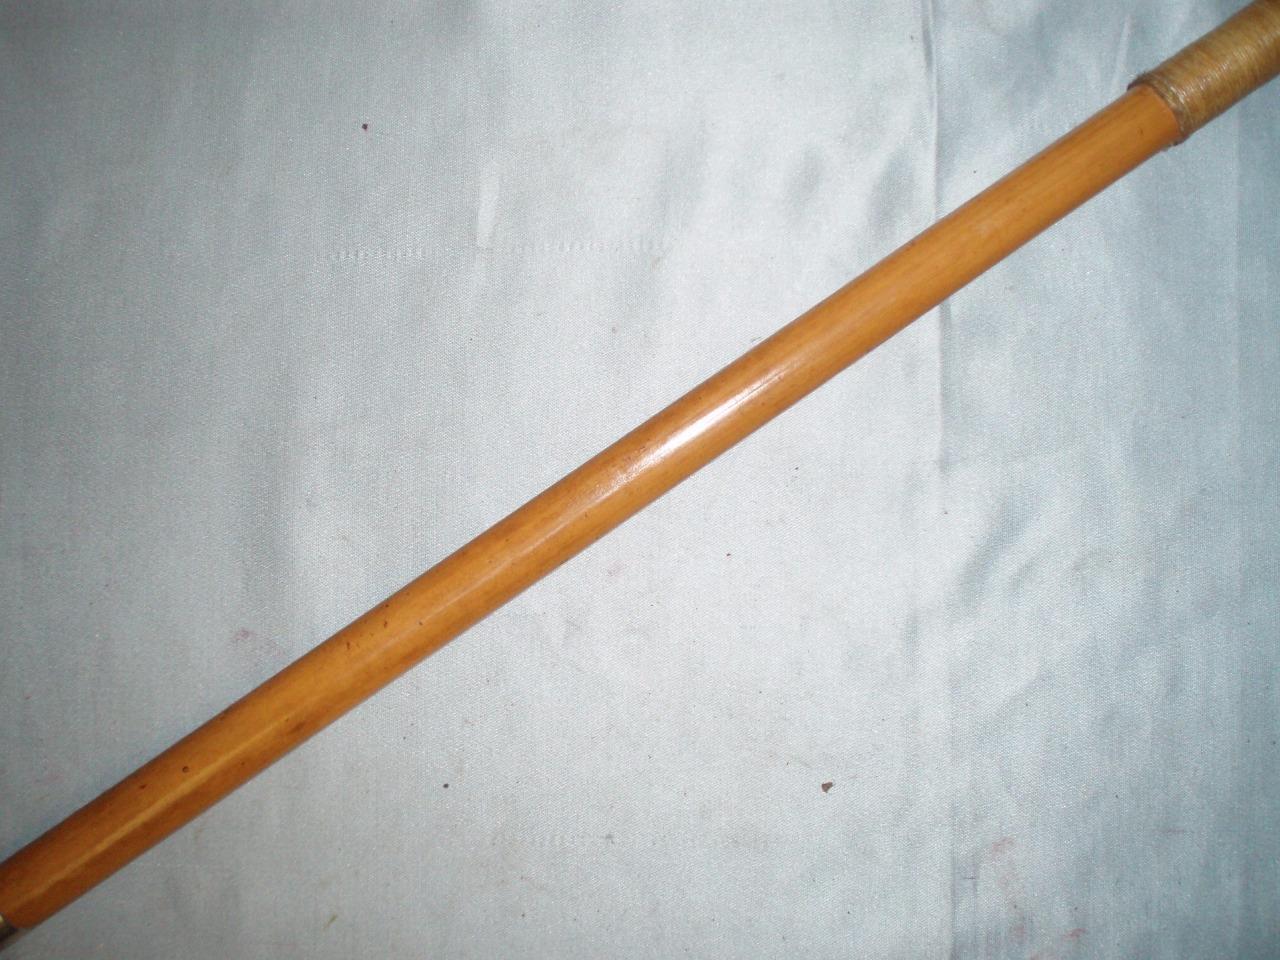 Antiguo Caza Whip Plata Plata Whip Placa Match seguro Vester Y Striker.. 3564b7